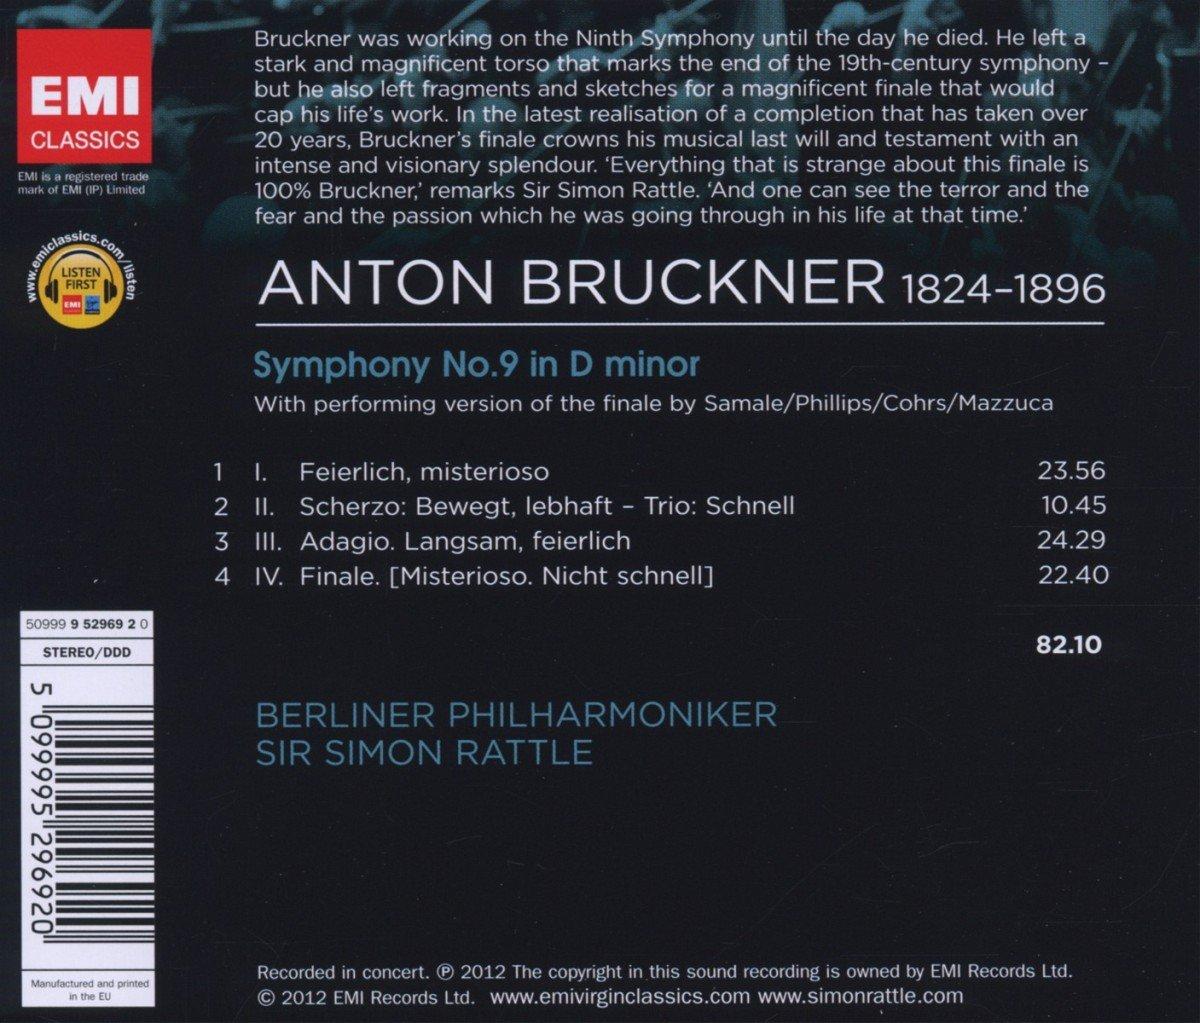 Sinfonie 9 (4 Sätze) - Simon Rattle, Bp, Anton Bruckner: Amazon.de: Musik